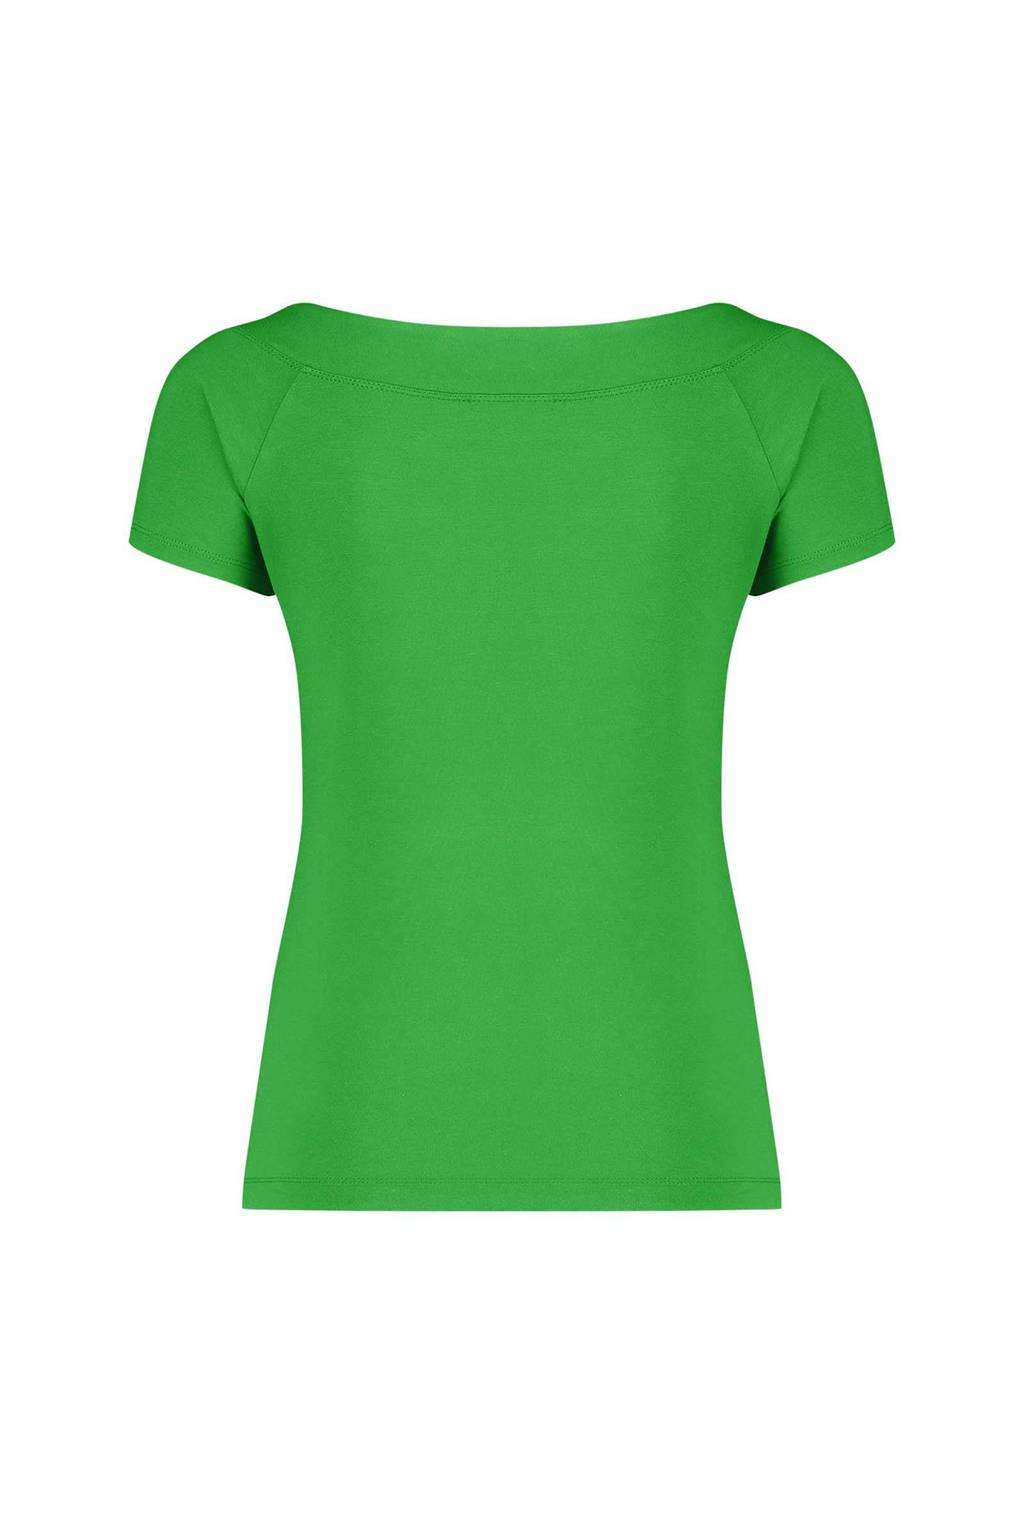 Claudia Sträter top groen, Groen